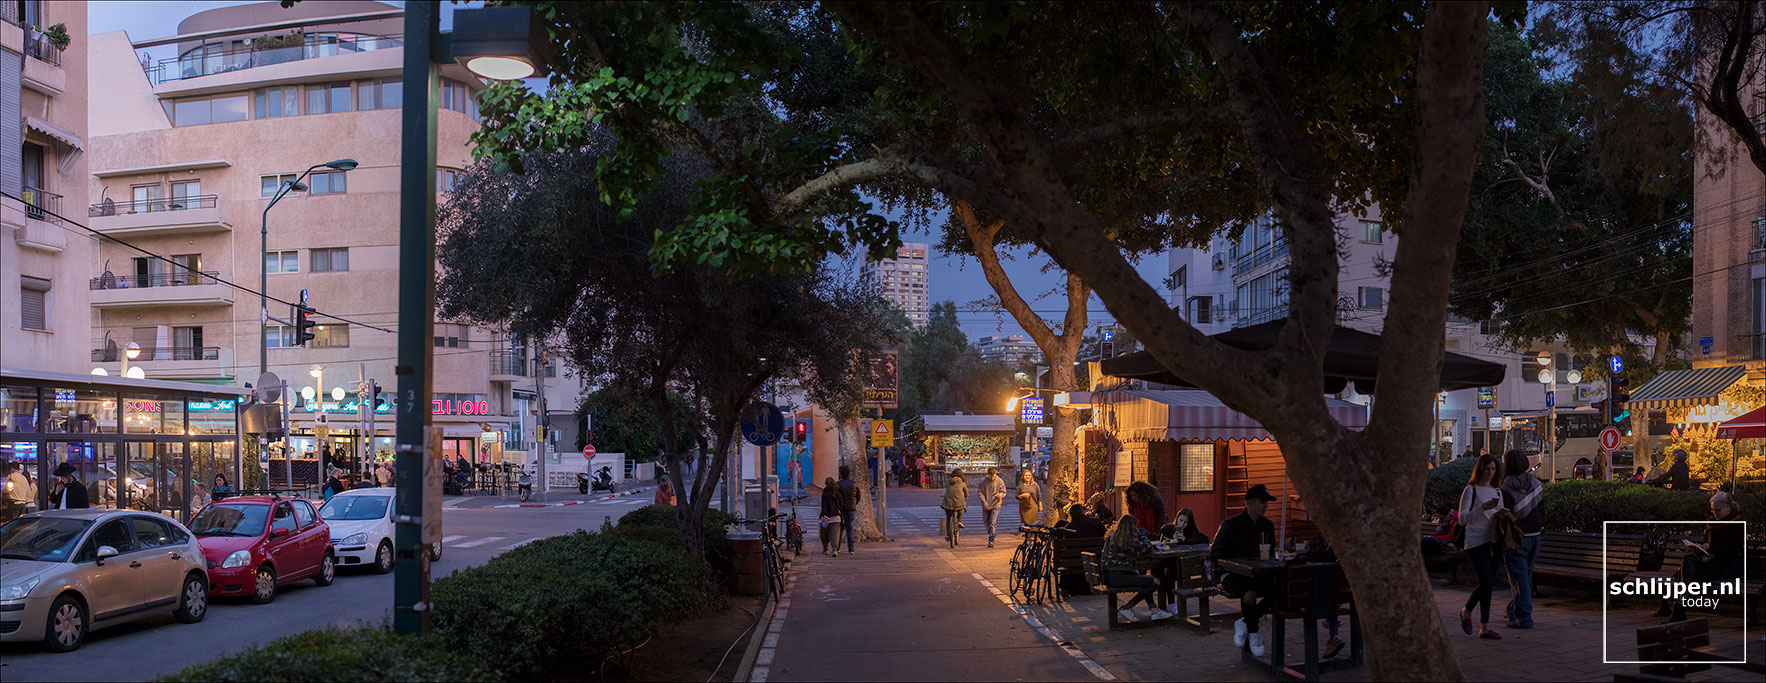 Israel, Tel Aviv, 3 januari 2018